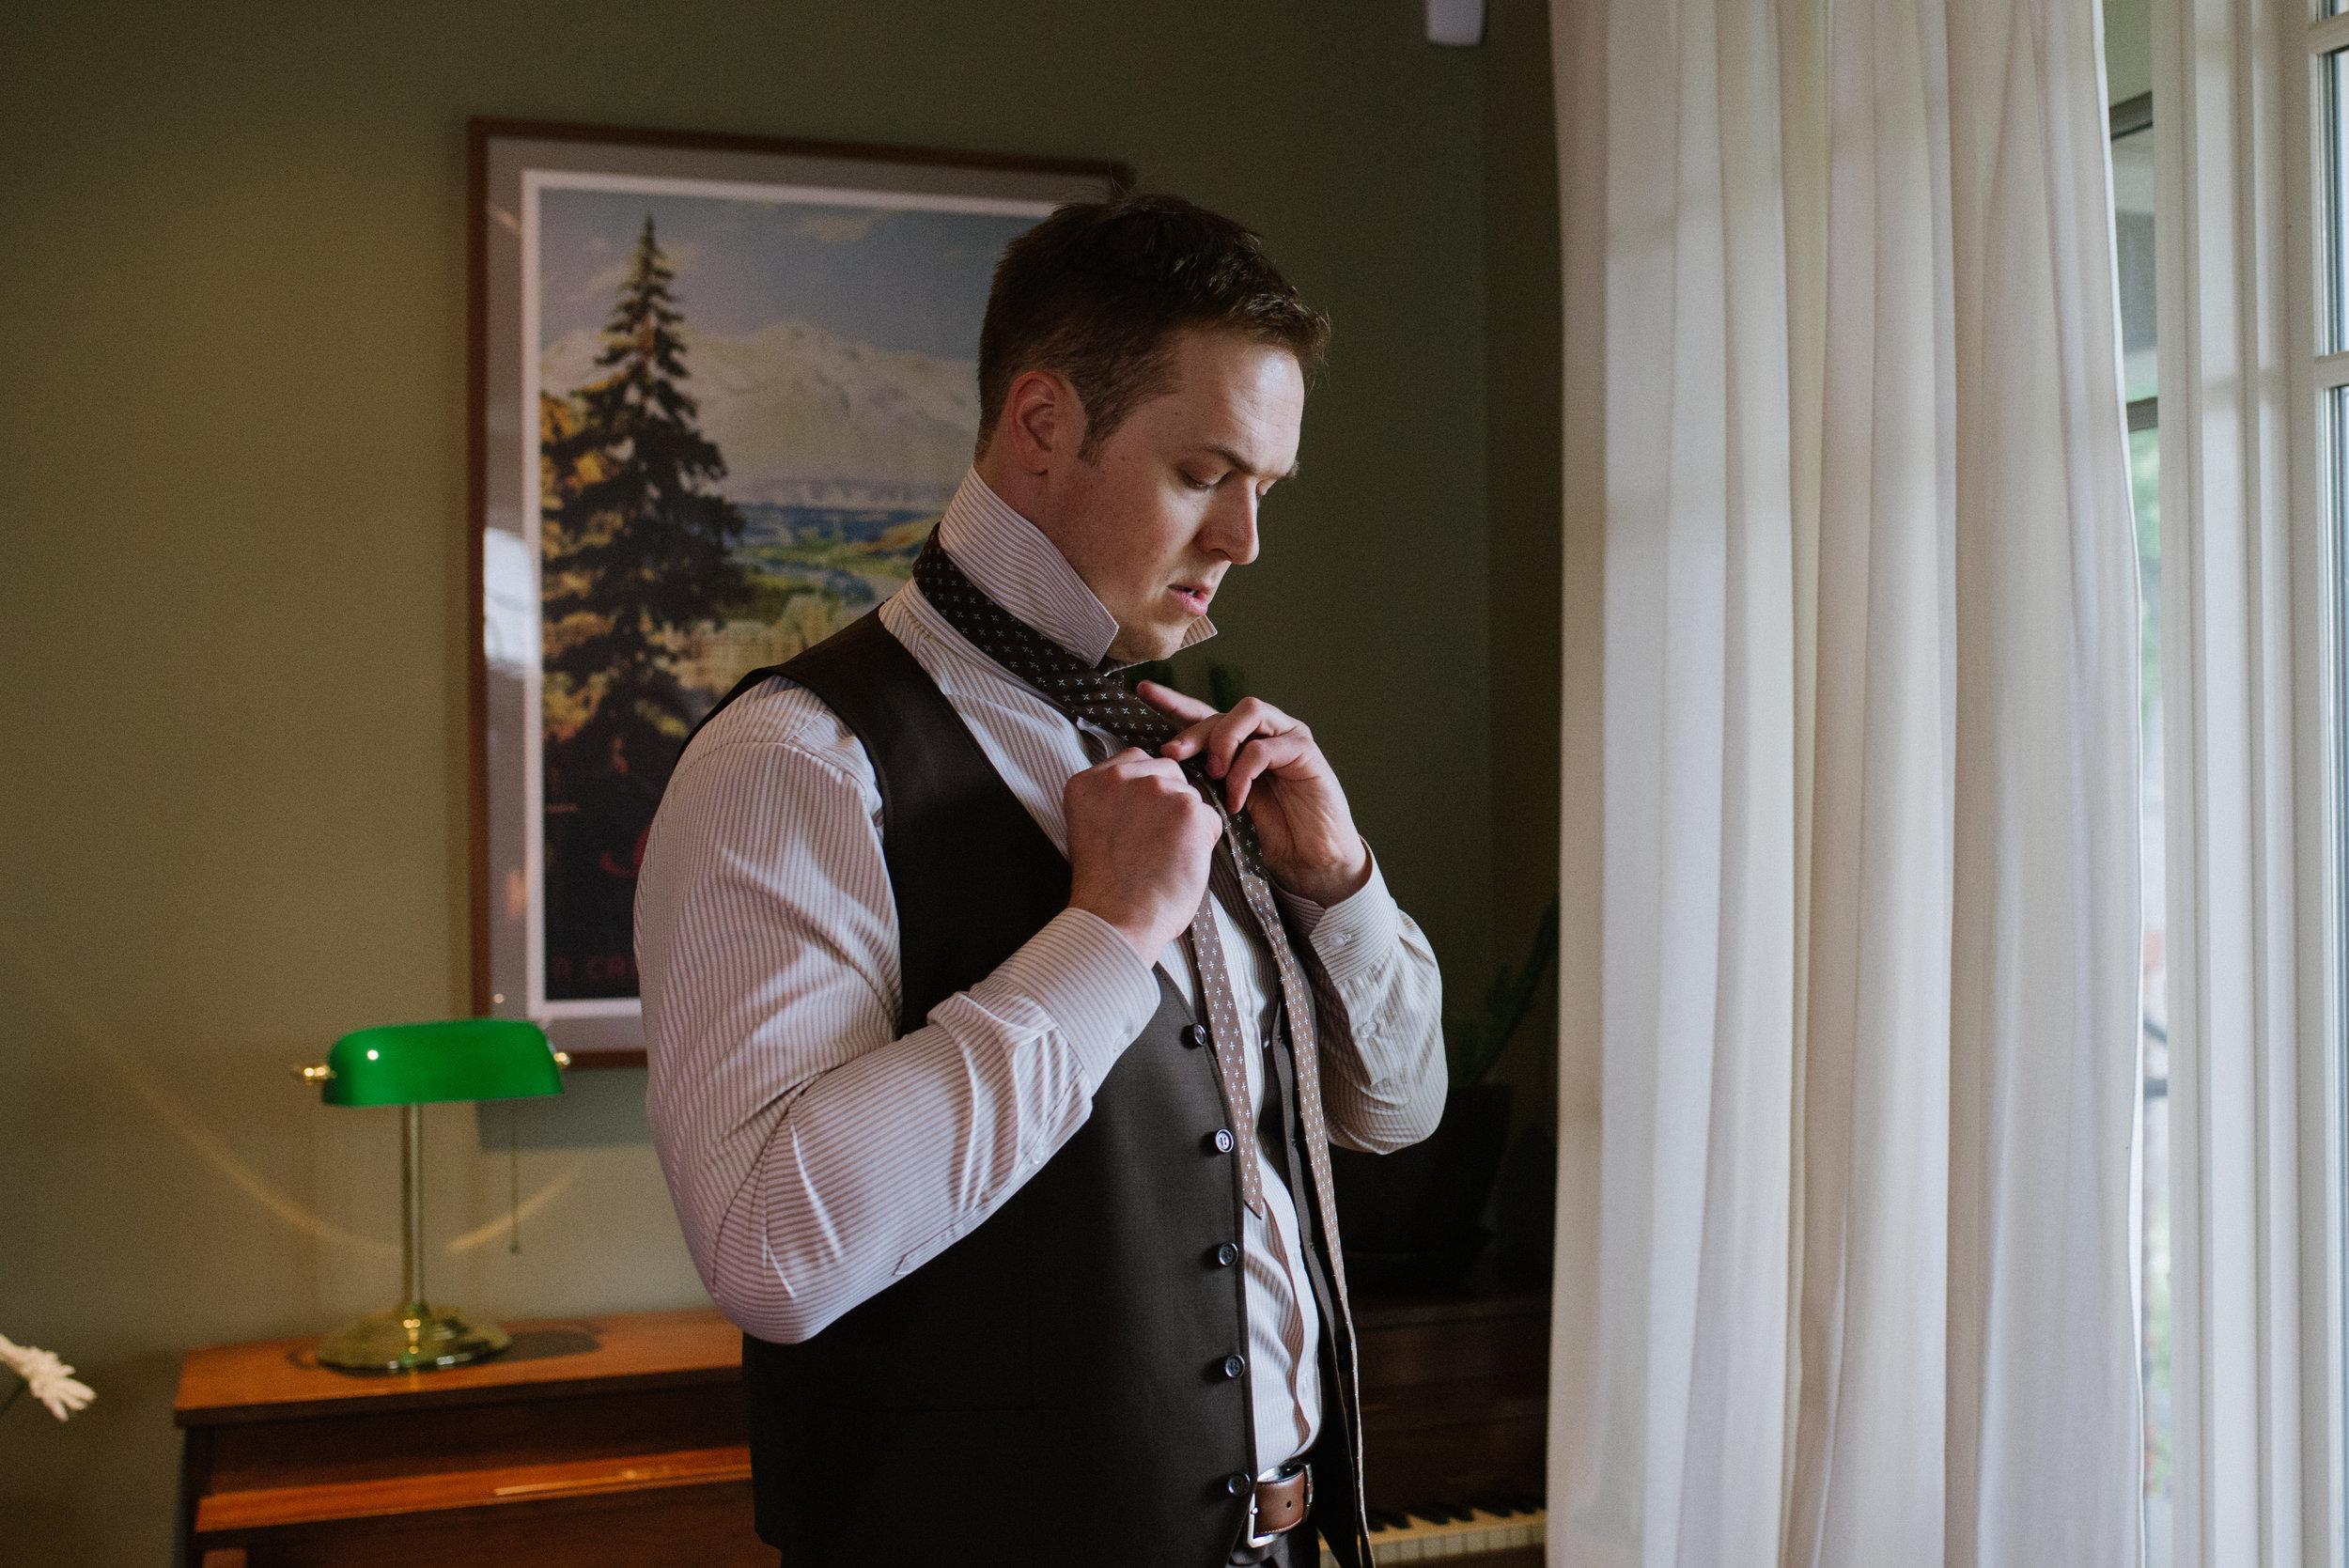 Teatro_Wedding_Calgary_Wedding_Photography_Vanessa_Tom_Married_2018_HR096.jpg